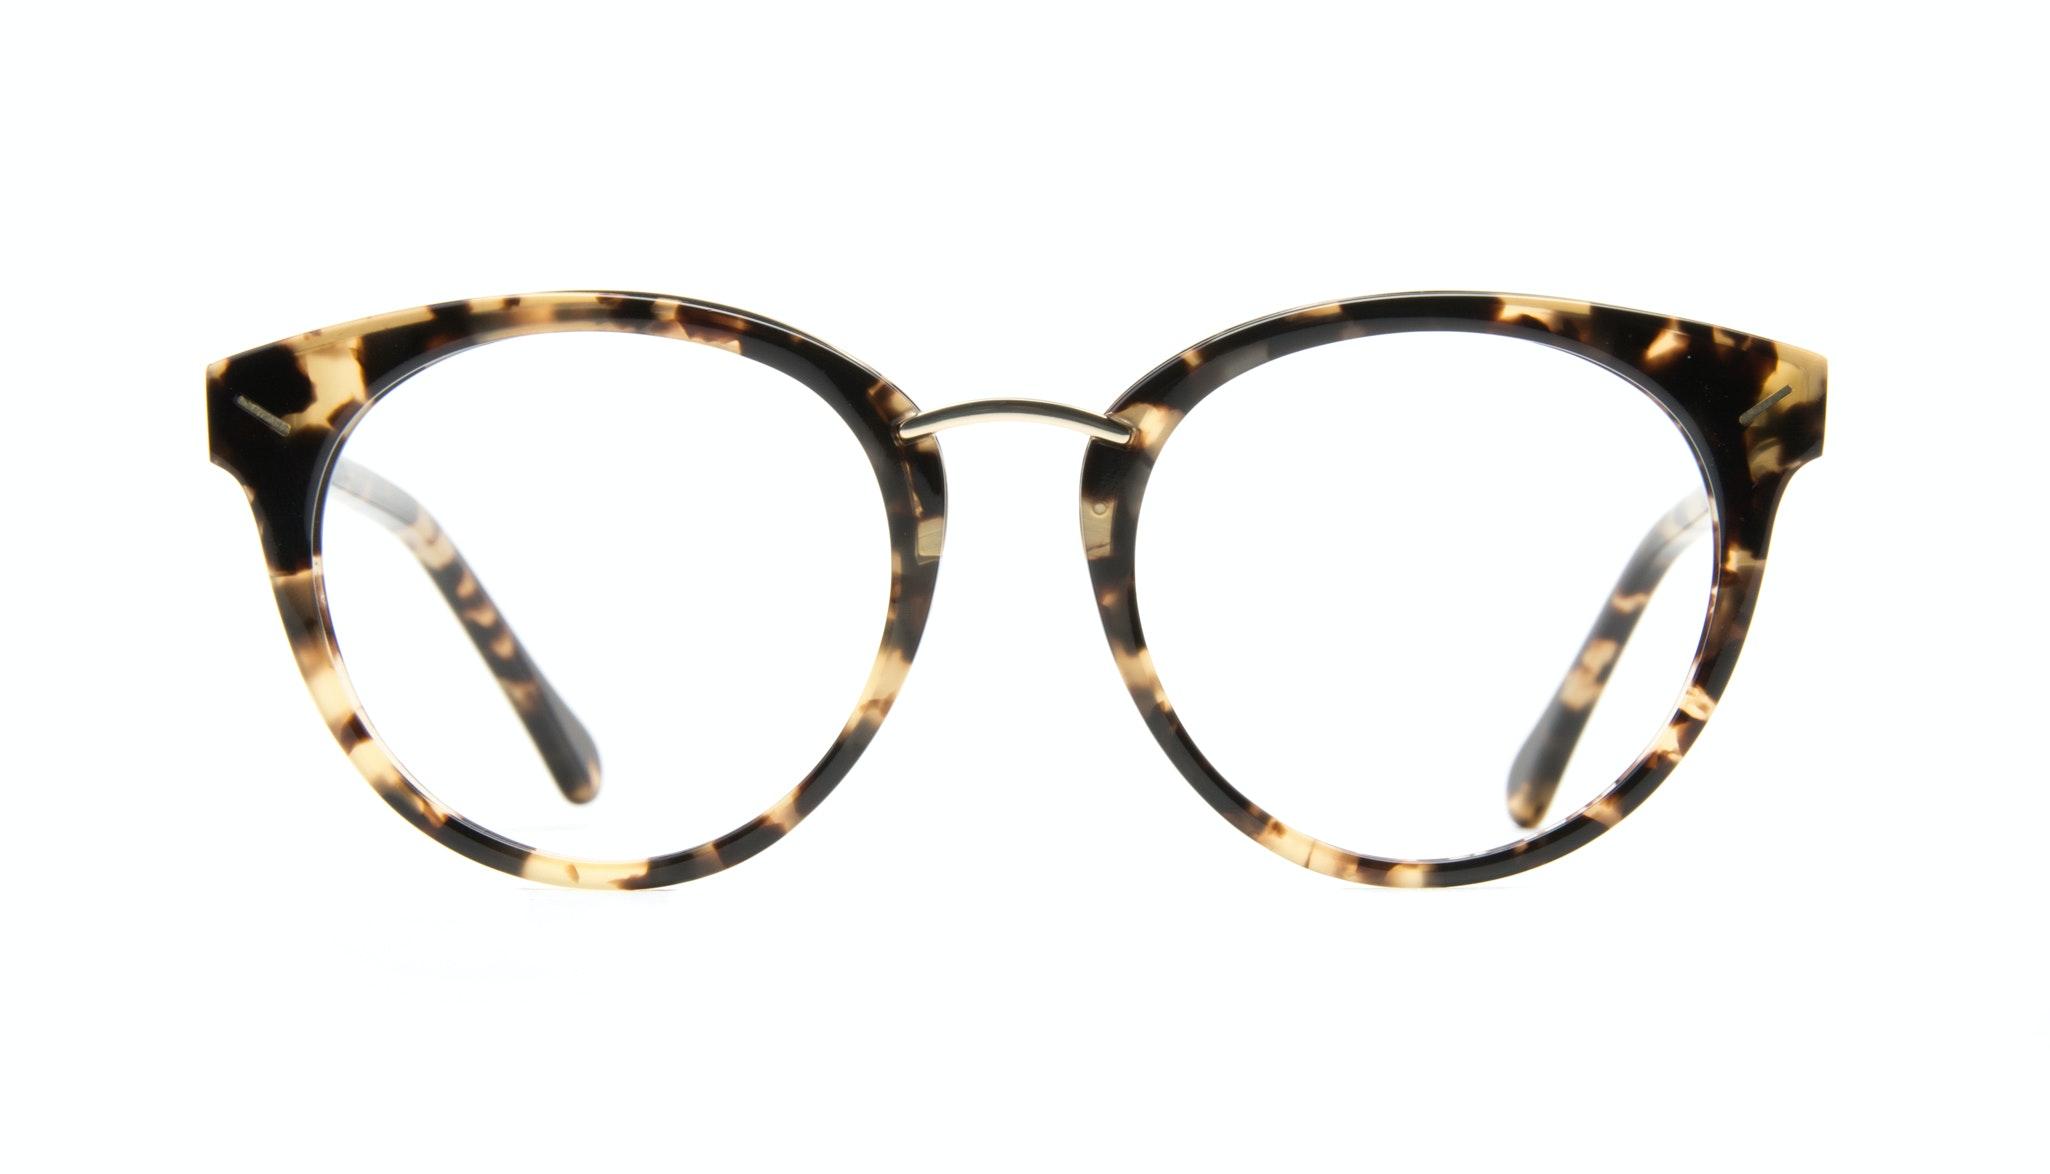 Affordable Fashion Glasses Cat Eye Round Eyeglasses Women Element Gold Tort Front